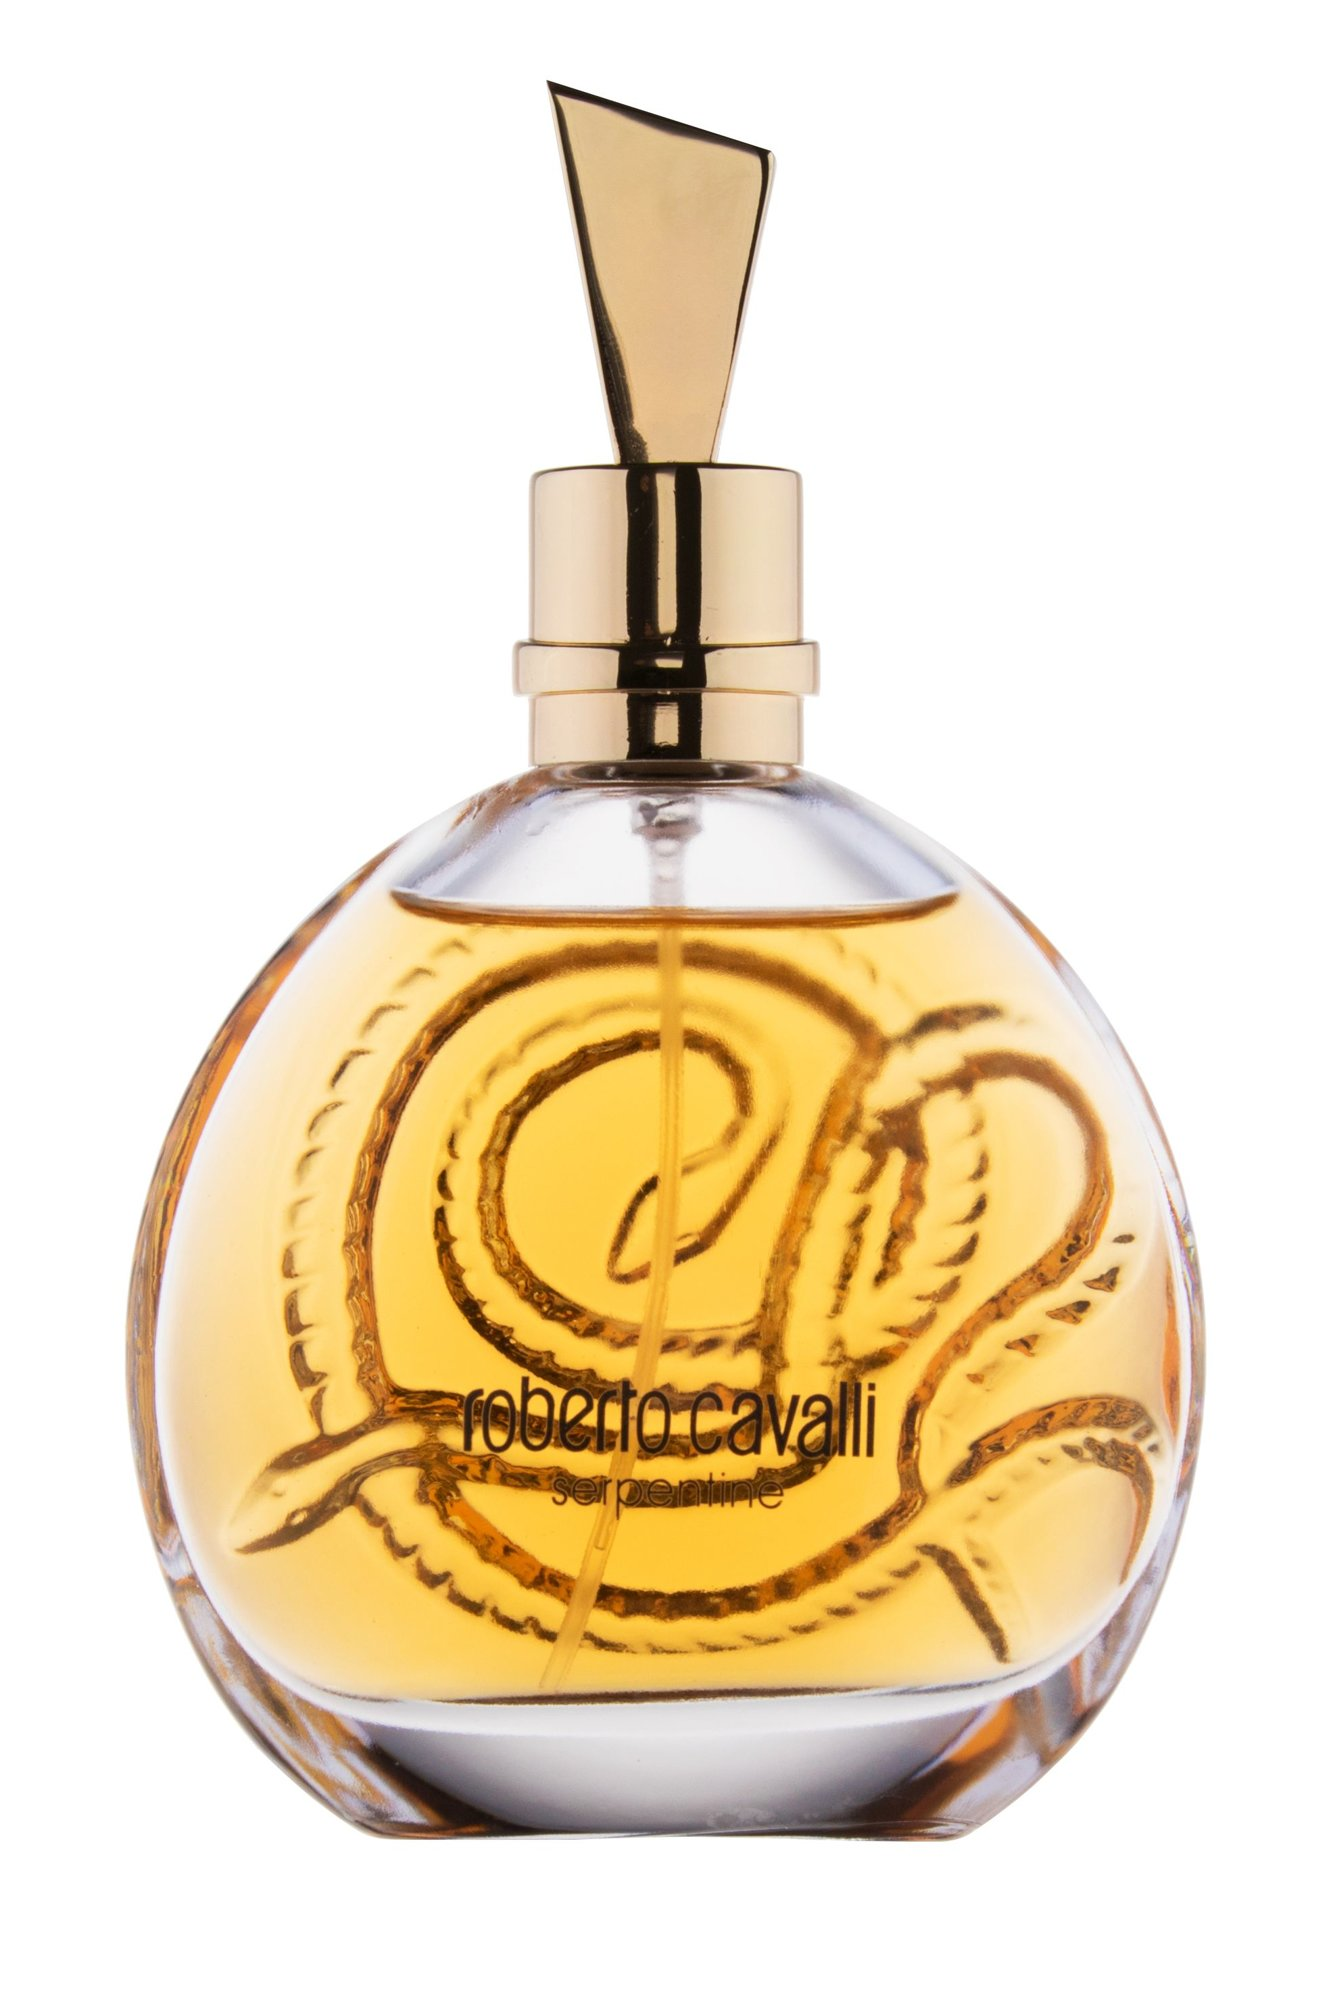 Roberto Cavalli Serpentine, Parfumovaná voda 100ml